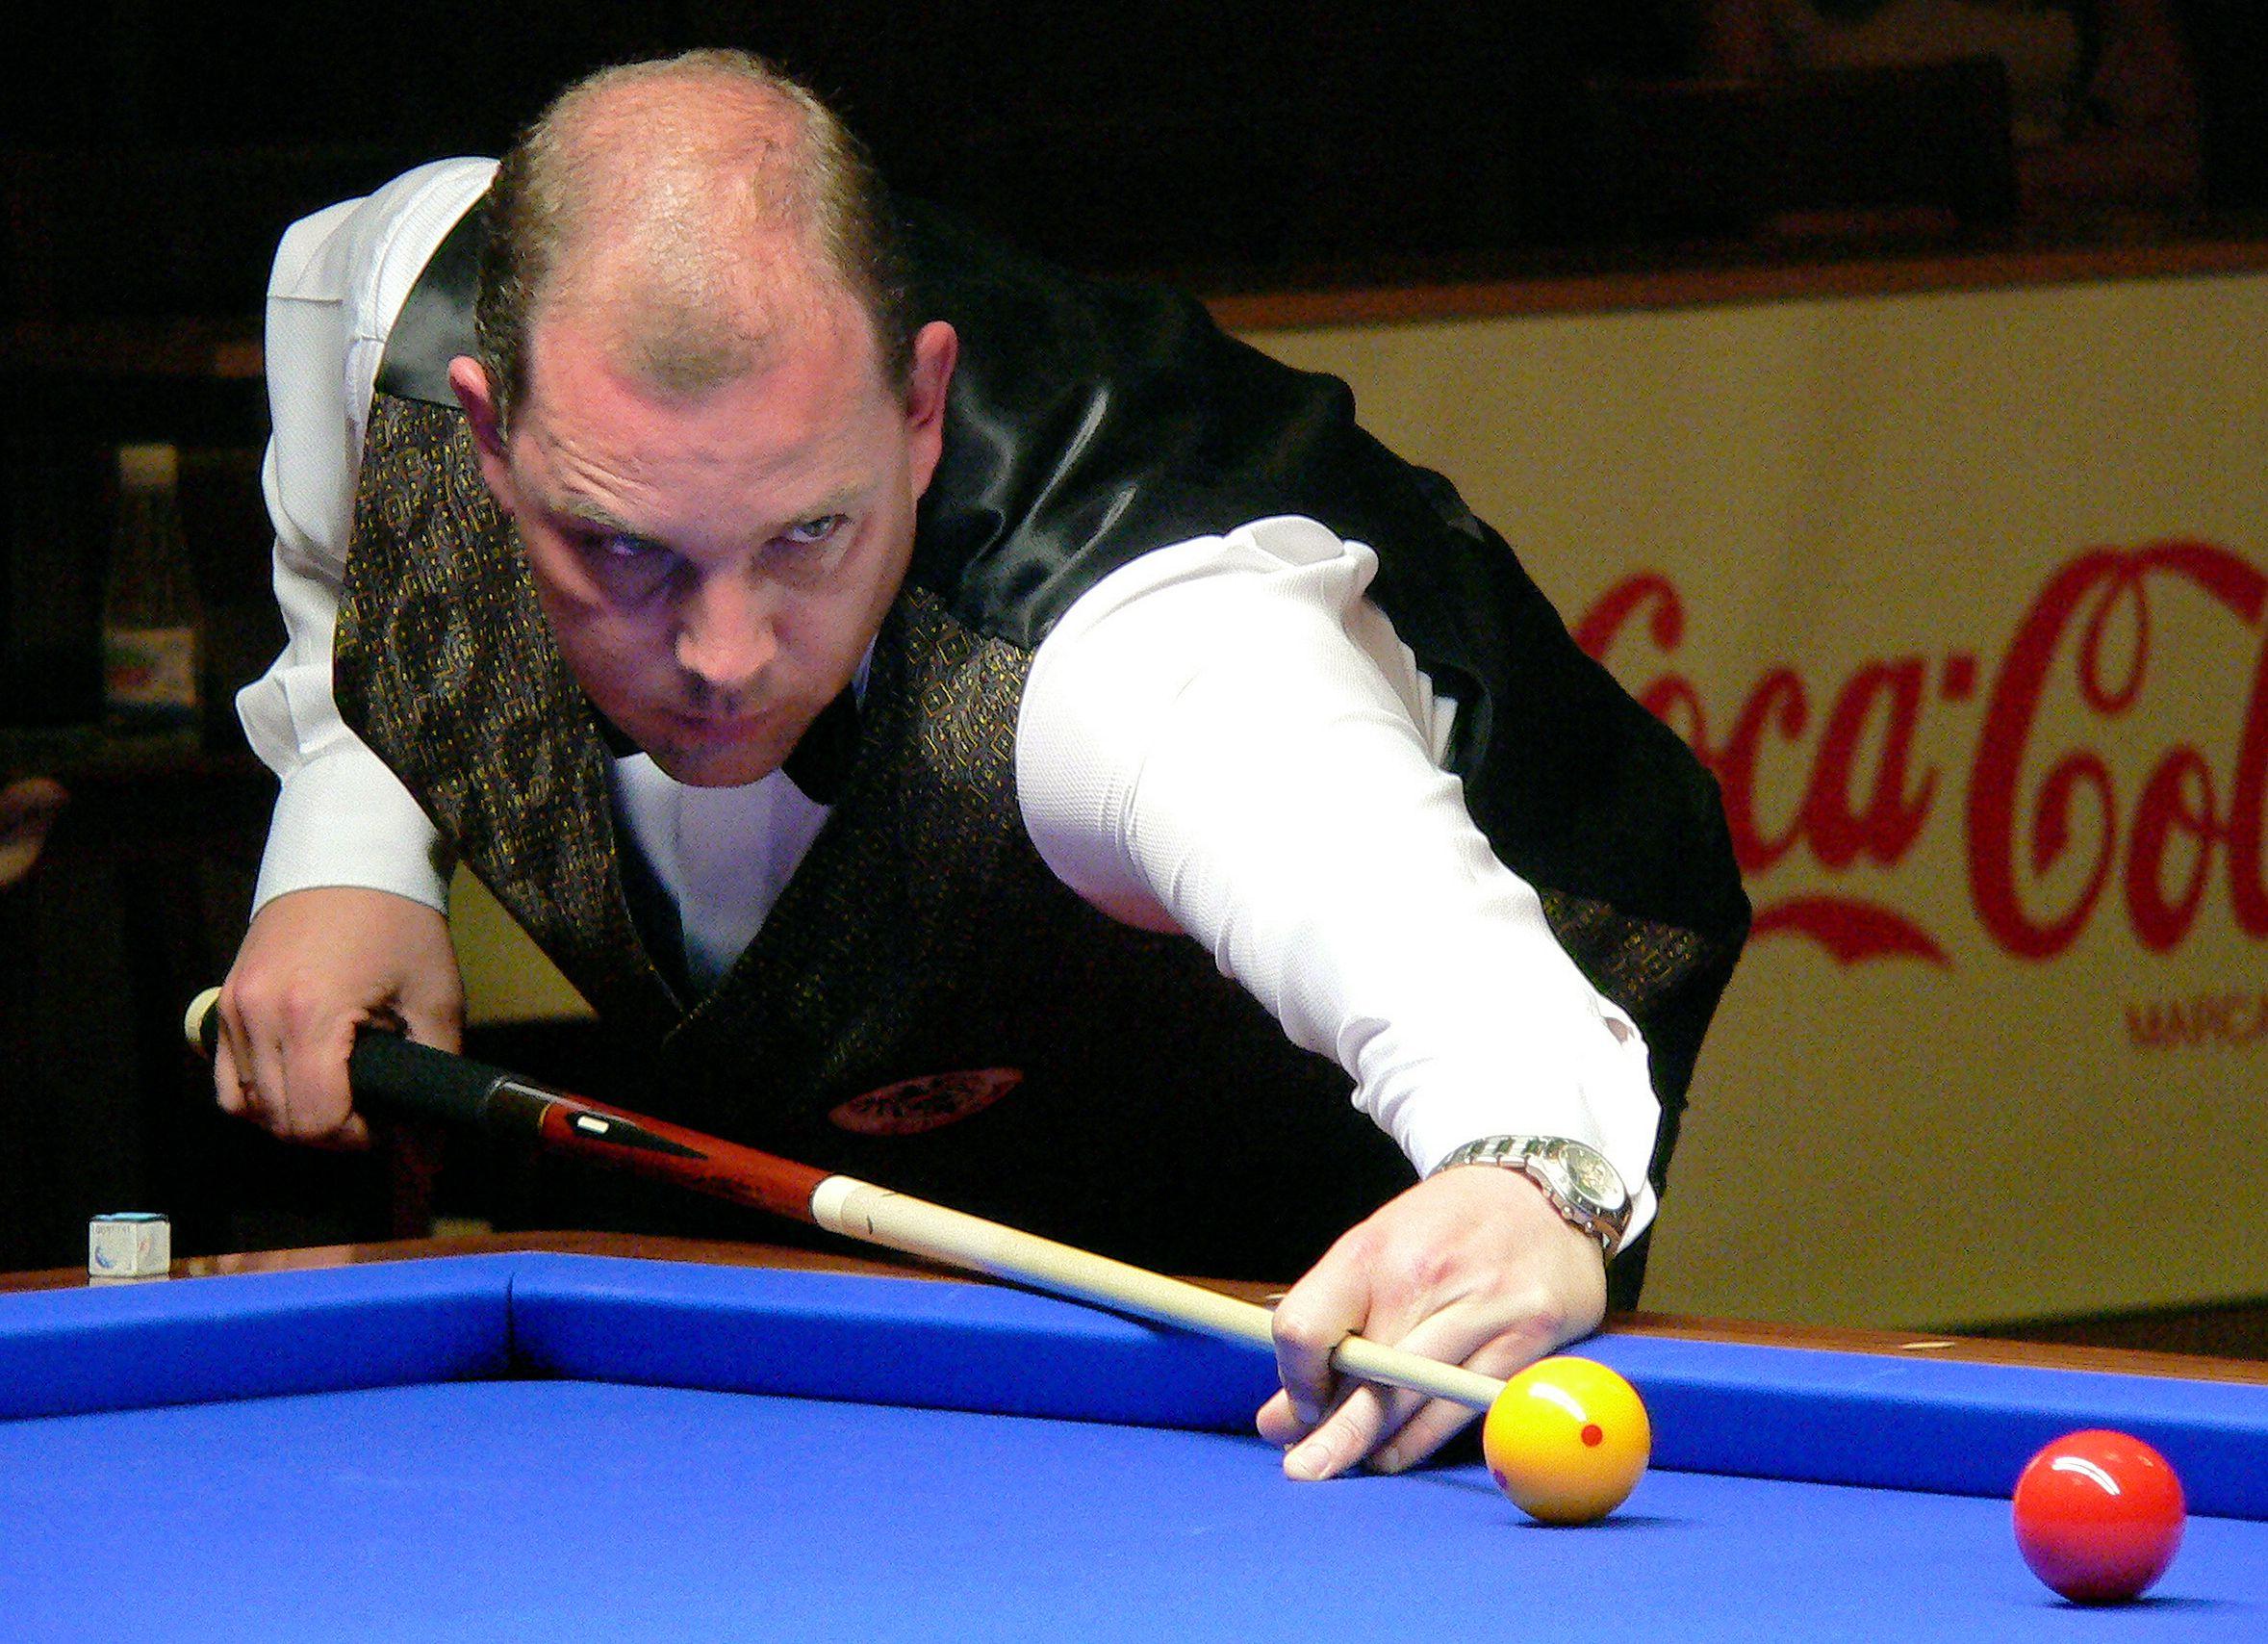 Heklepinnes: Championship Table In 2005